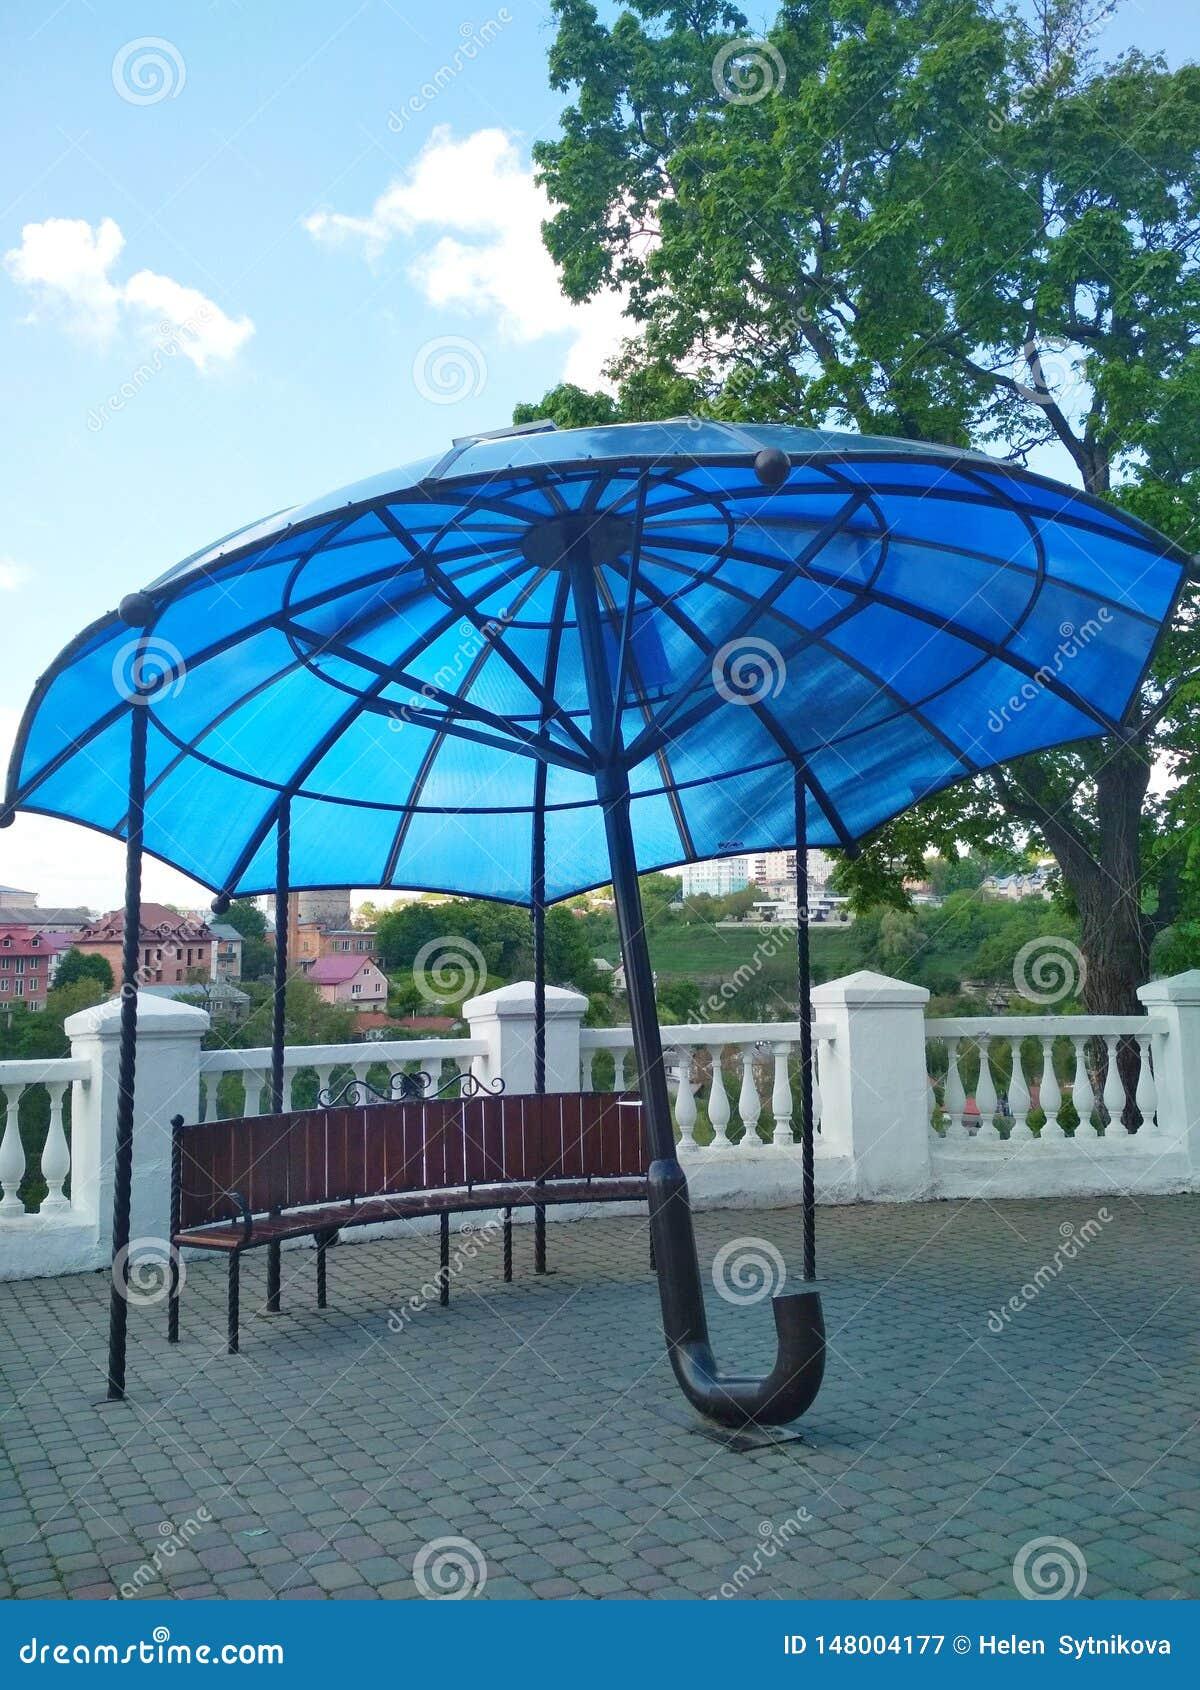 Moderne architectuur, blauwe paraplu, kamenets-Podolsky, de Oekra?ne